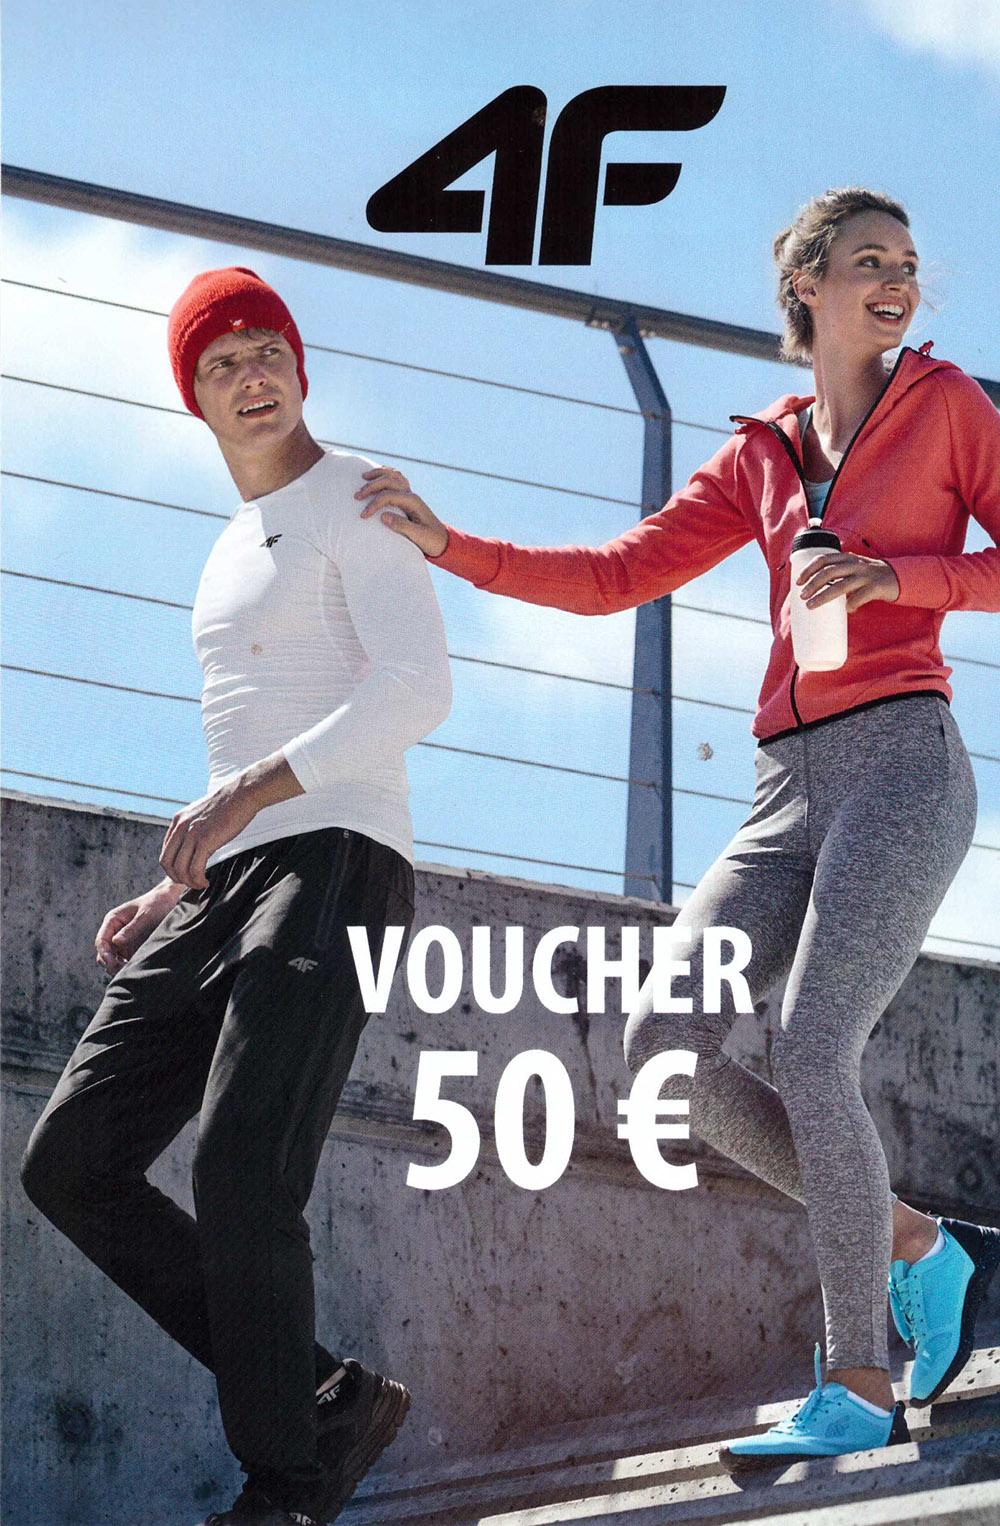 Voucher 50 eur do 4F